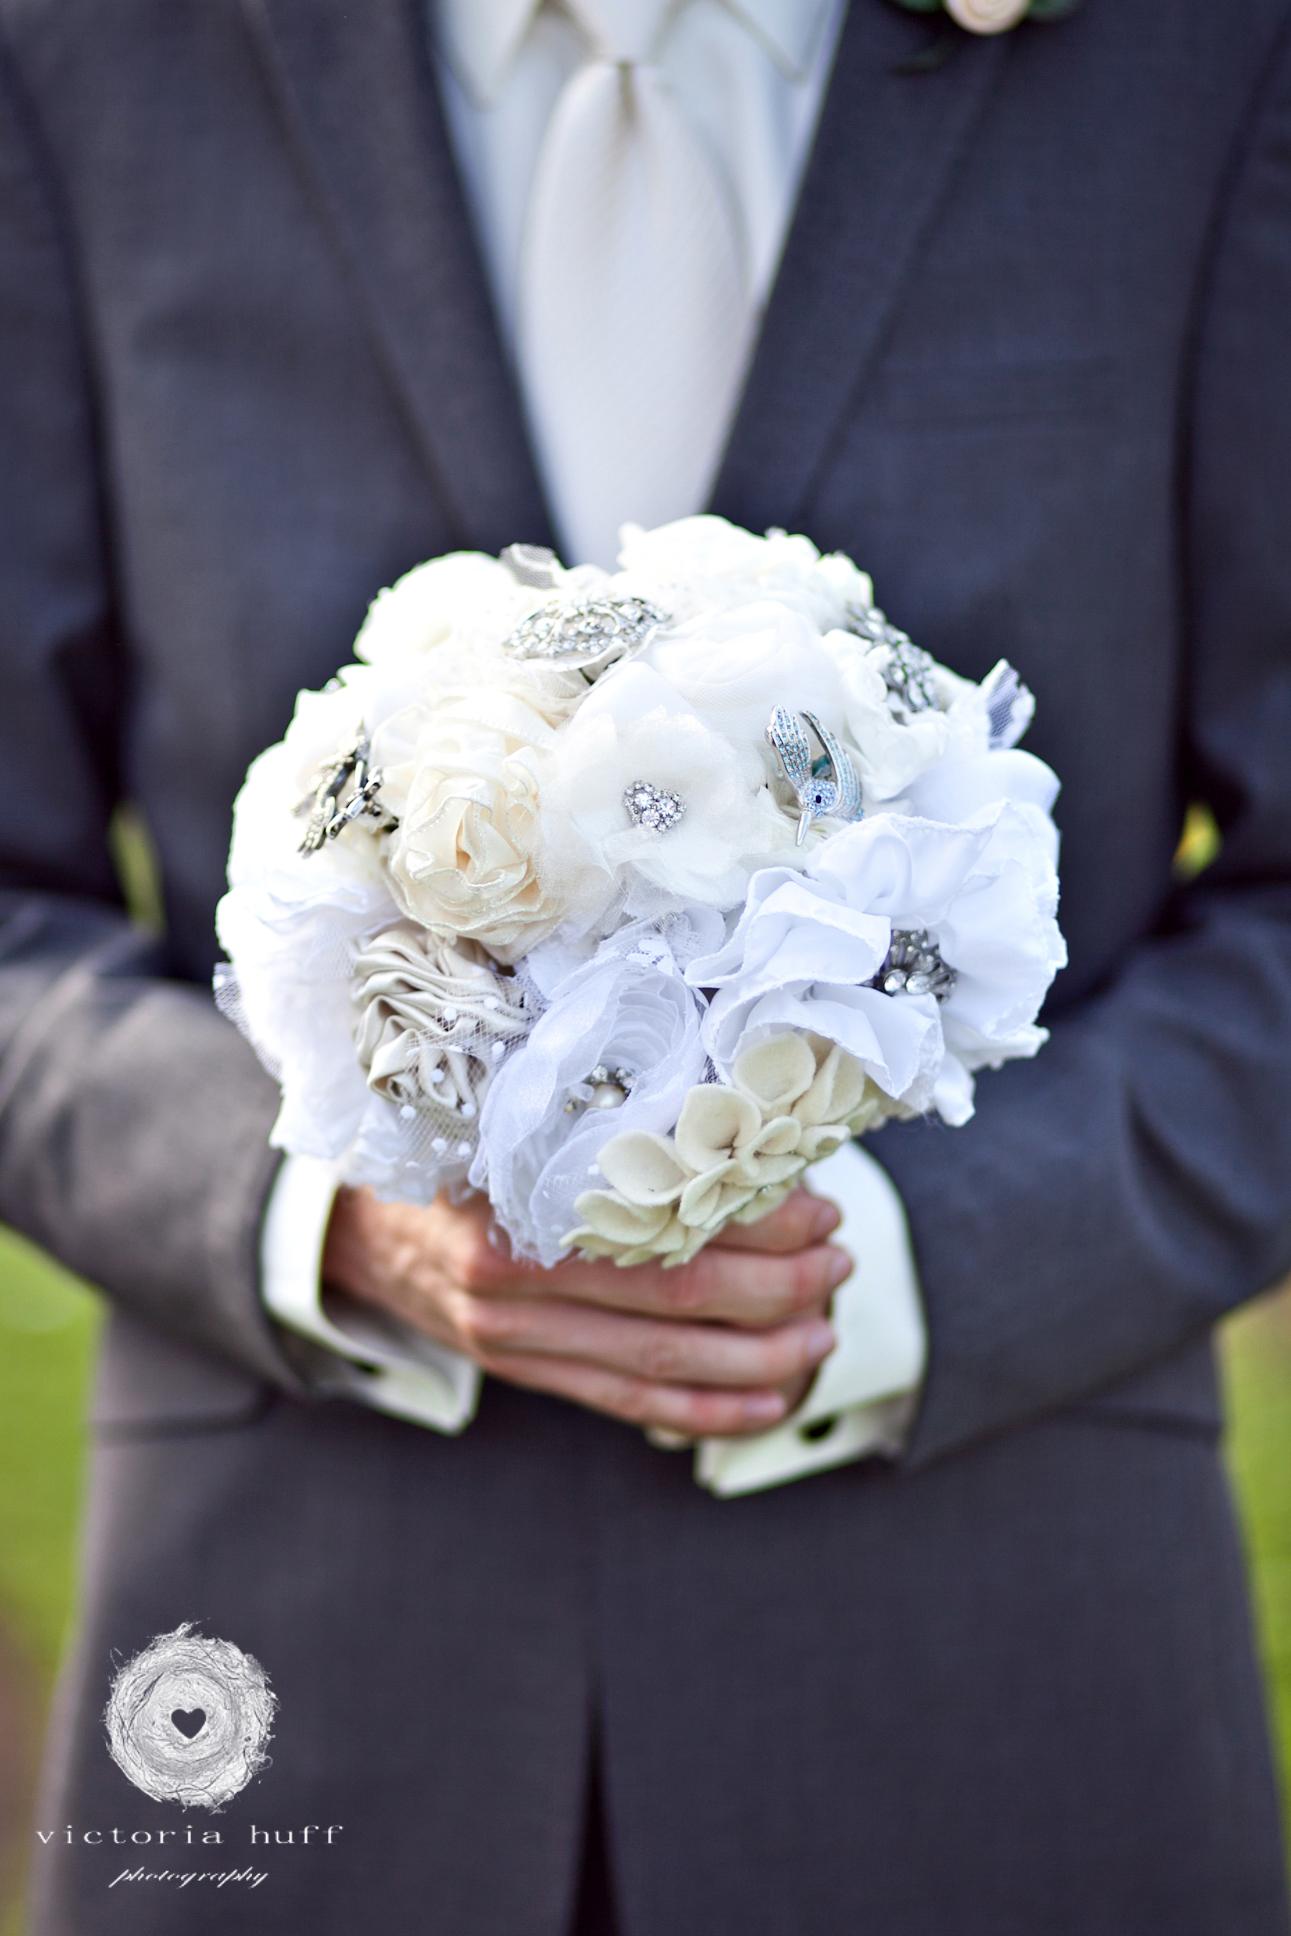 Wedding-Photography-Lindsay-Collins-Jason-Baggett-Wedding-Centennial-Park-Nashville-Tennessee-Hotel-Indigo-Vintage-387.jpg